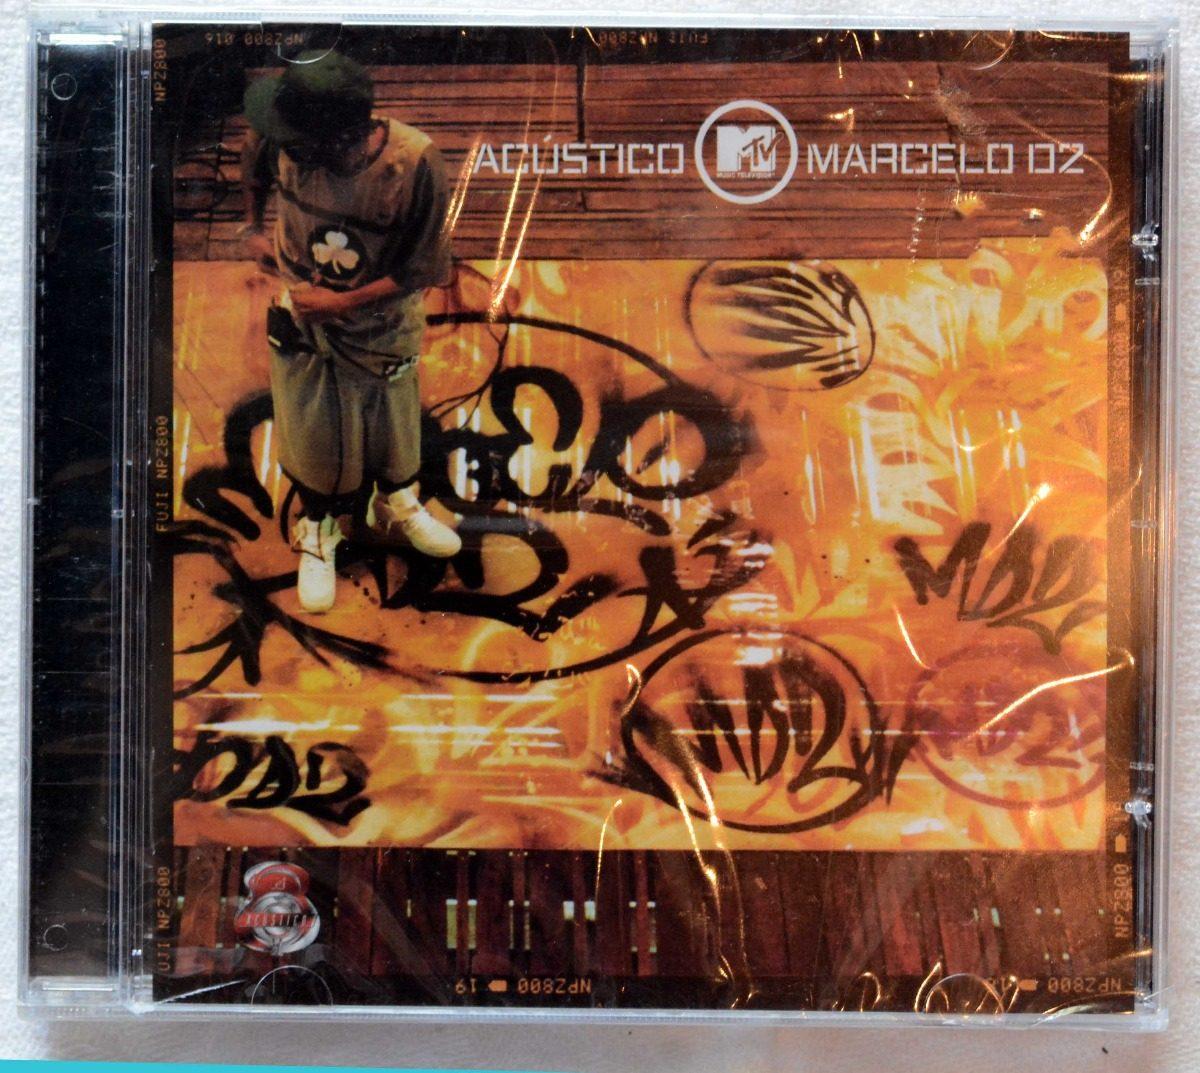 cd do marcelo d2 acustico mtv gratis